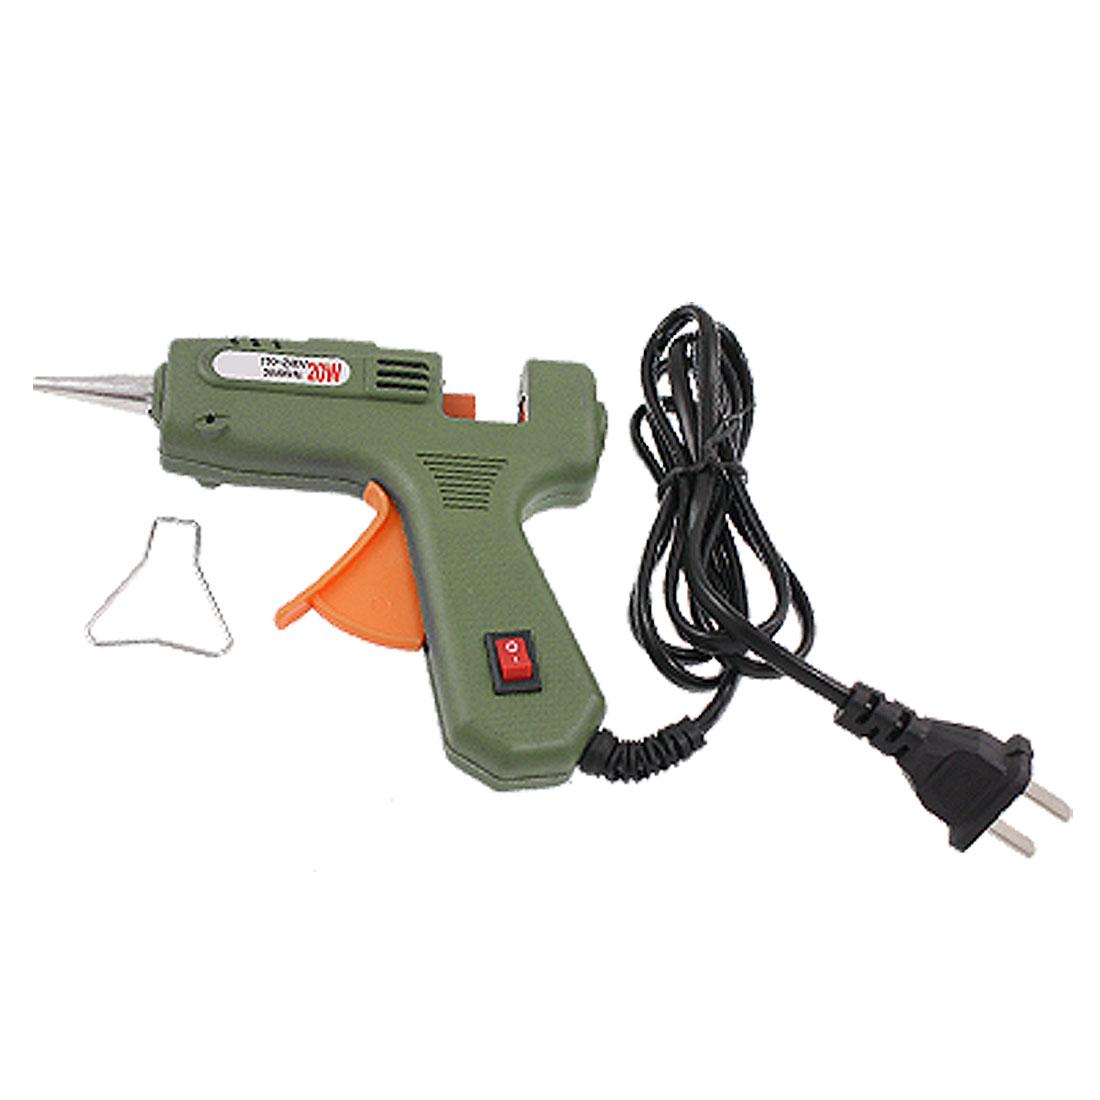 US Plug AC 110-240V 20W Green Trigger Hot Melt Glue Gun Tool